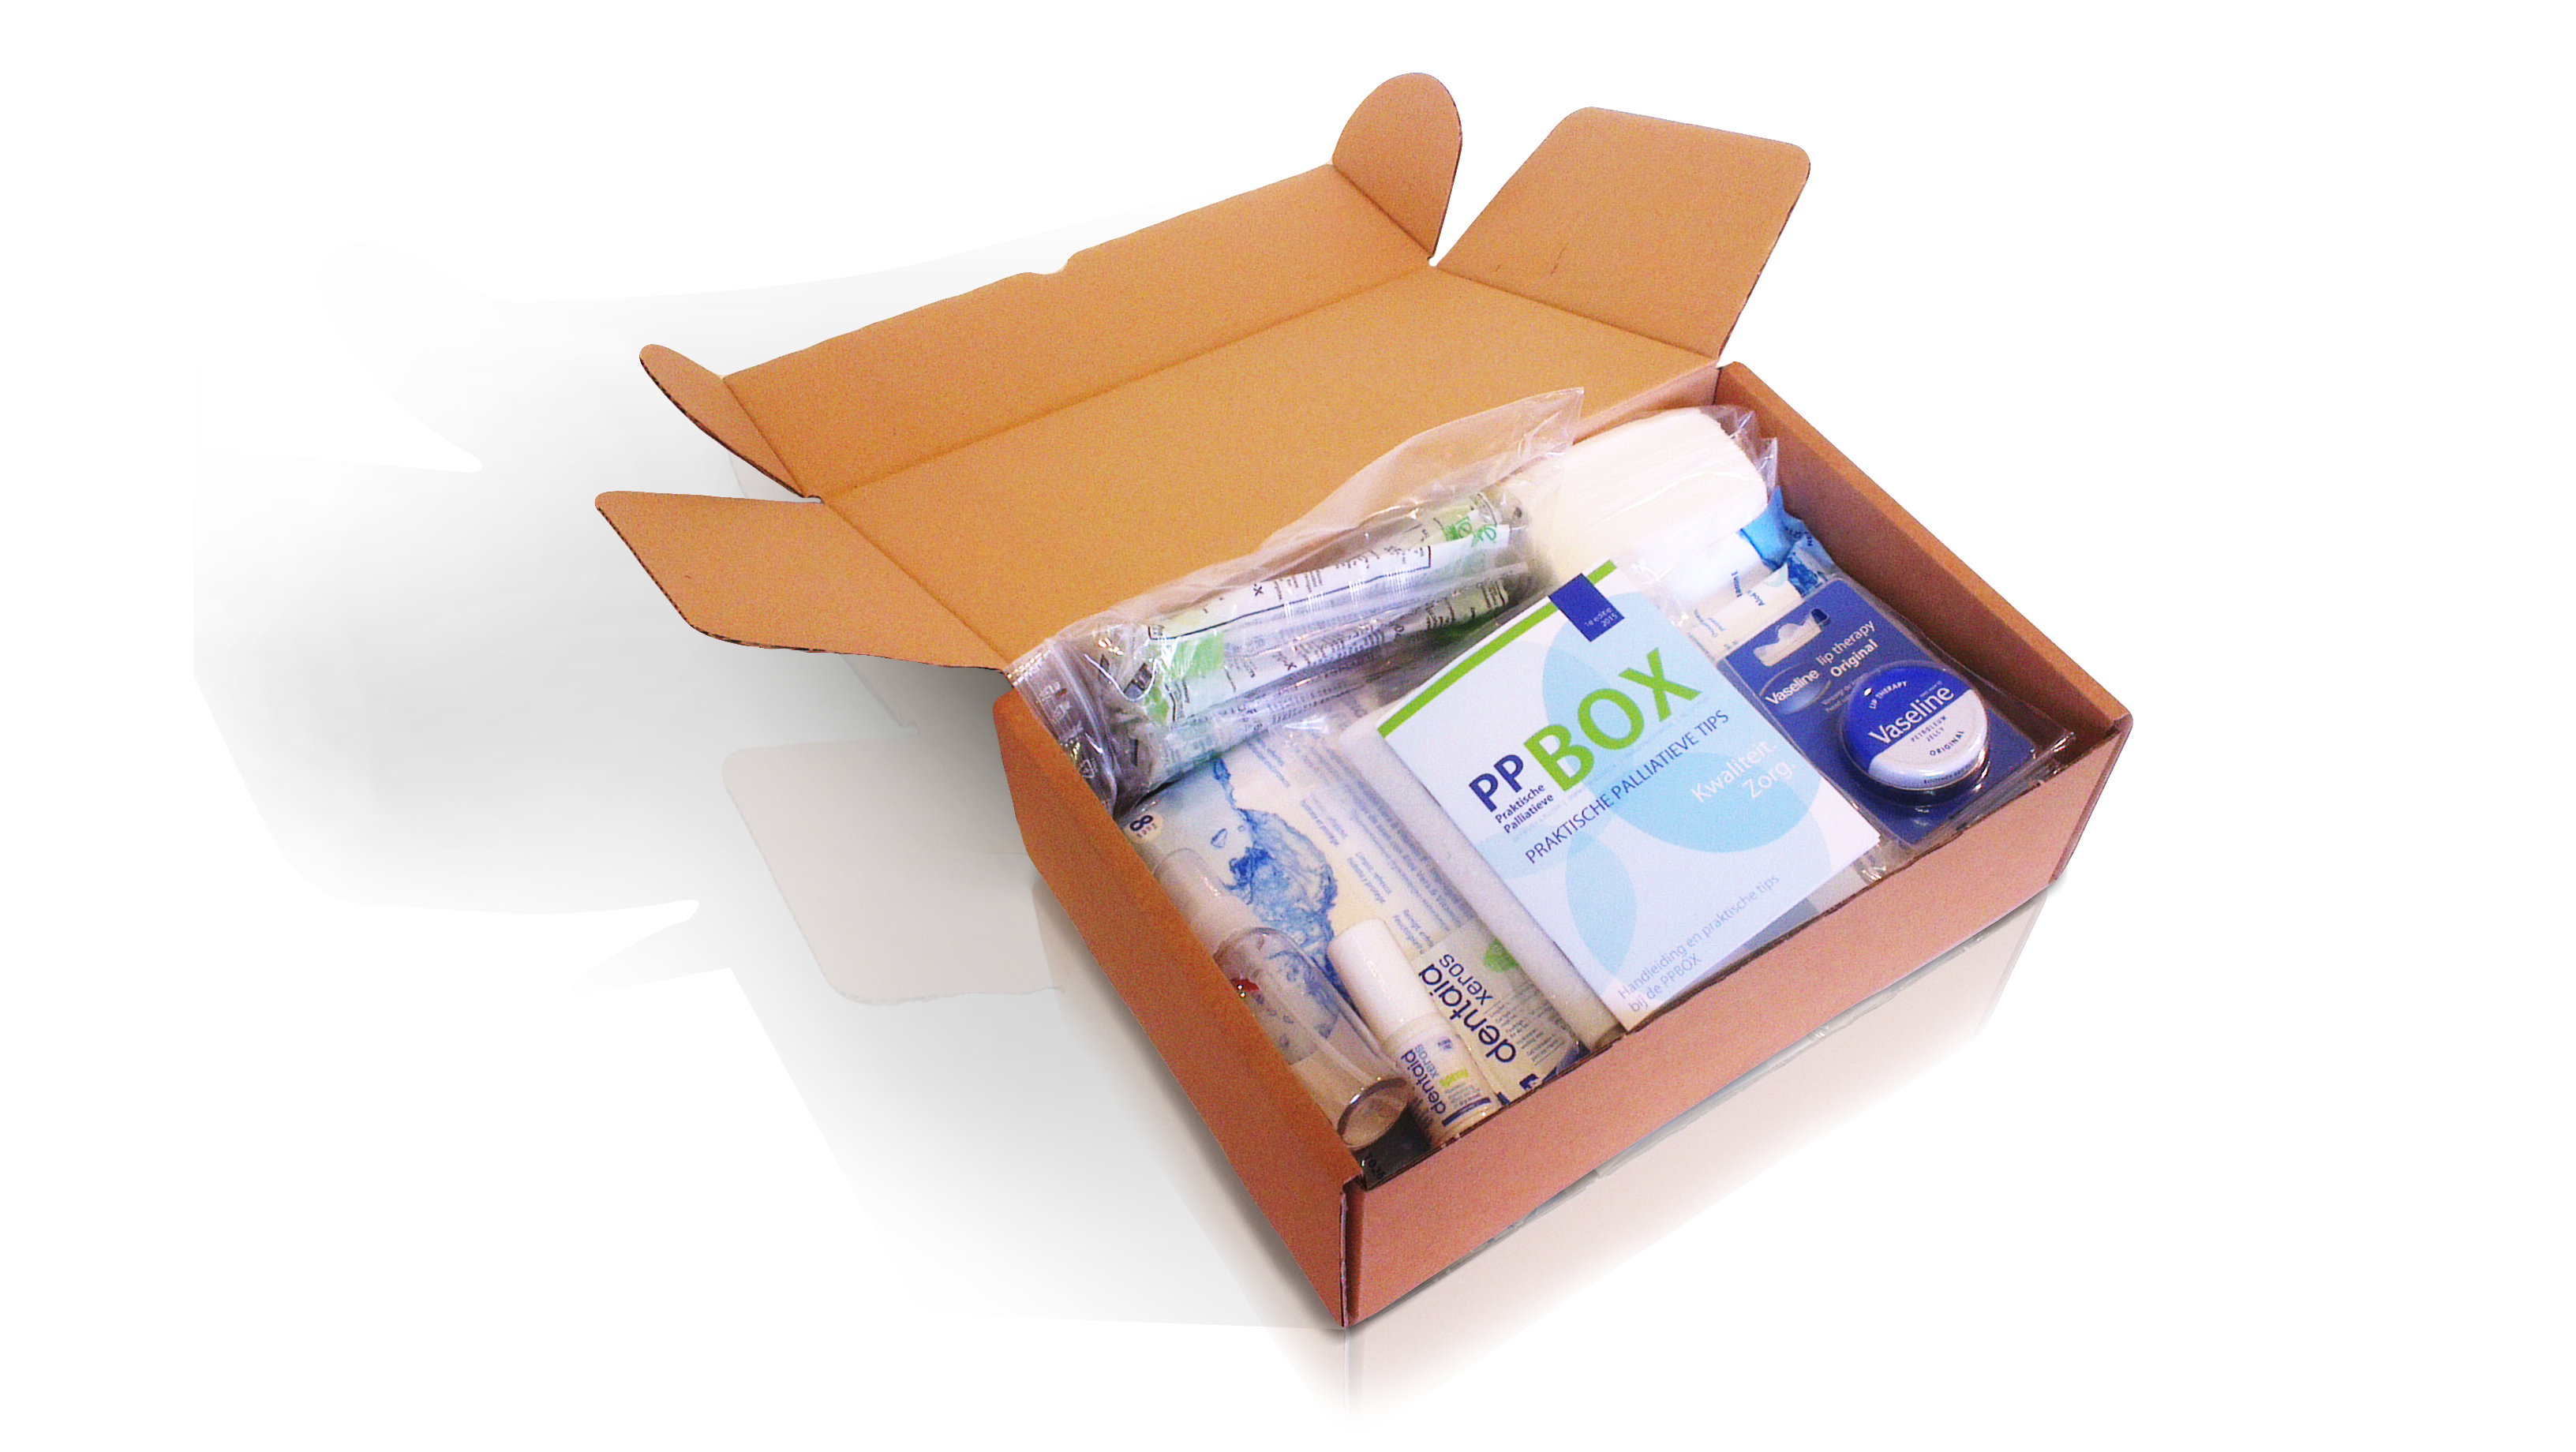 PPBOX, de Praktische palliatieve zorg box